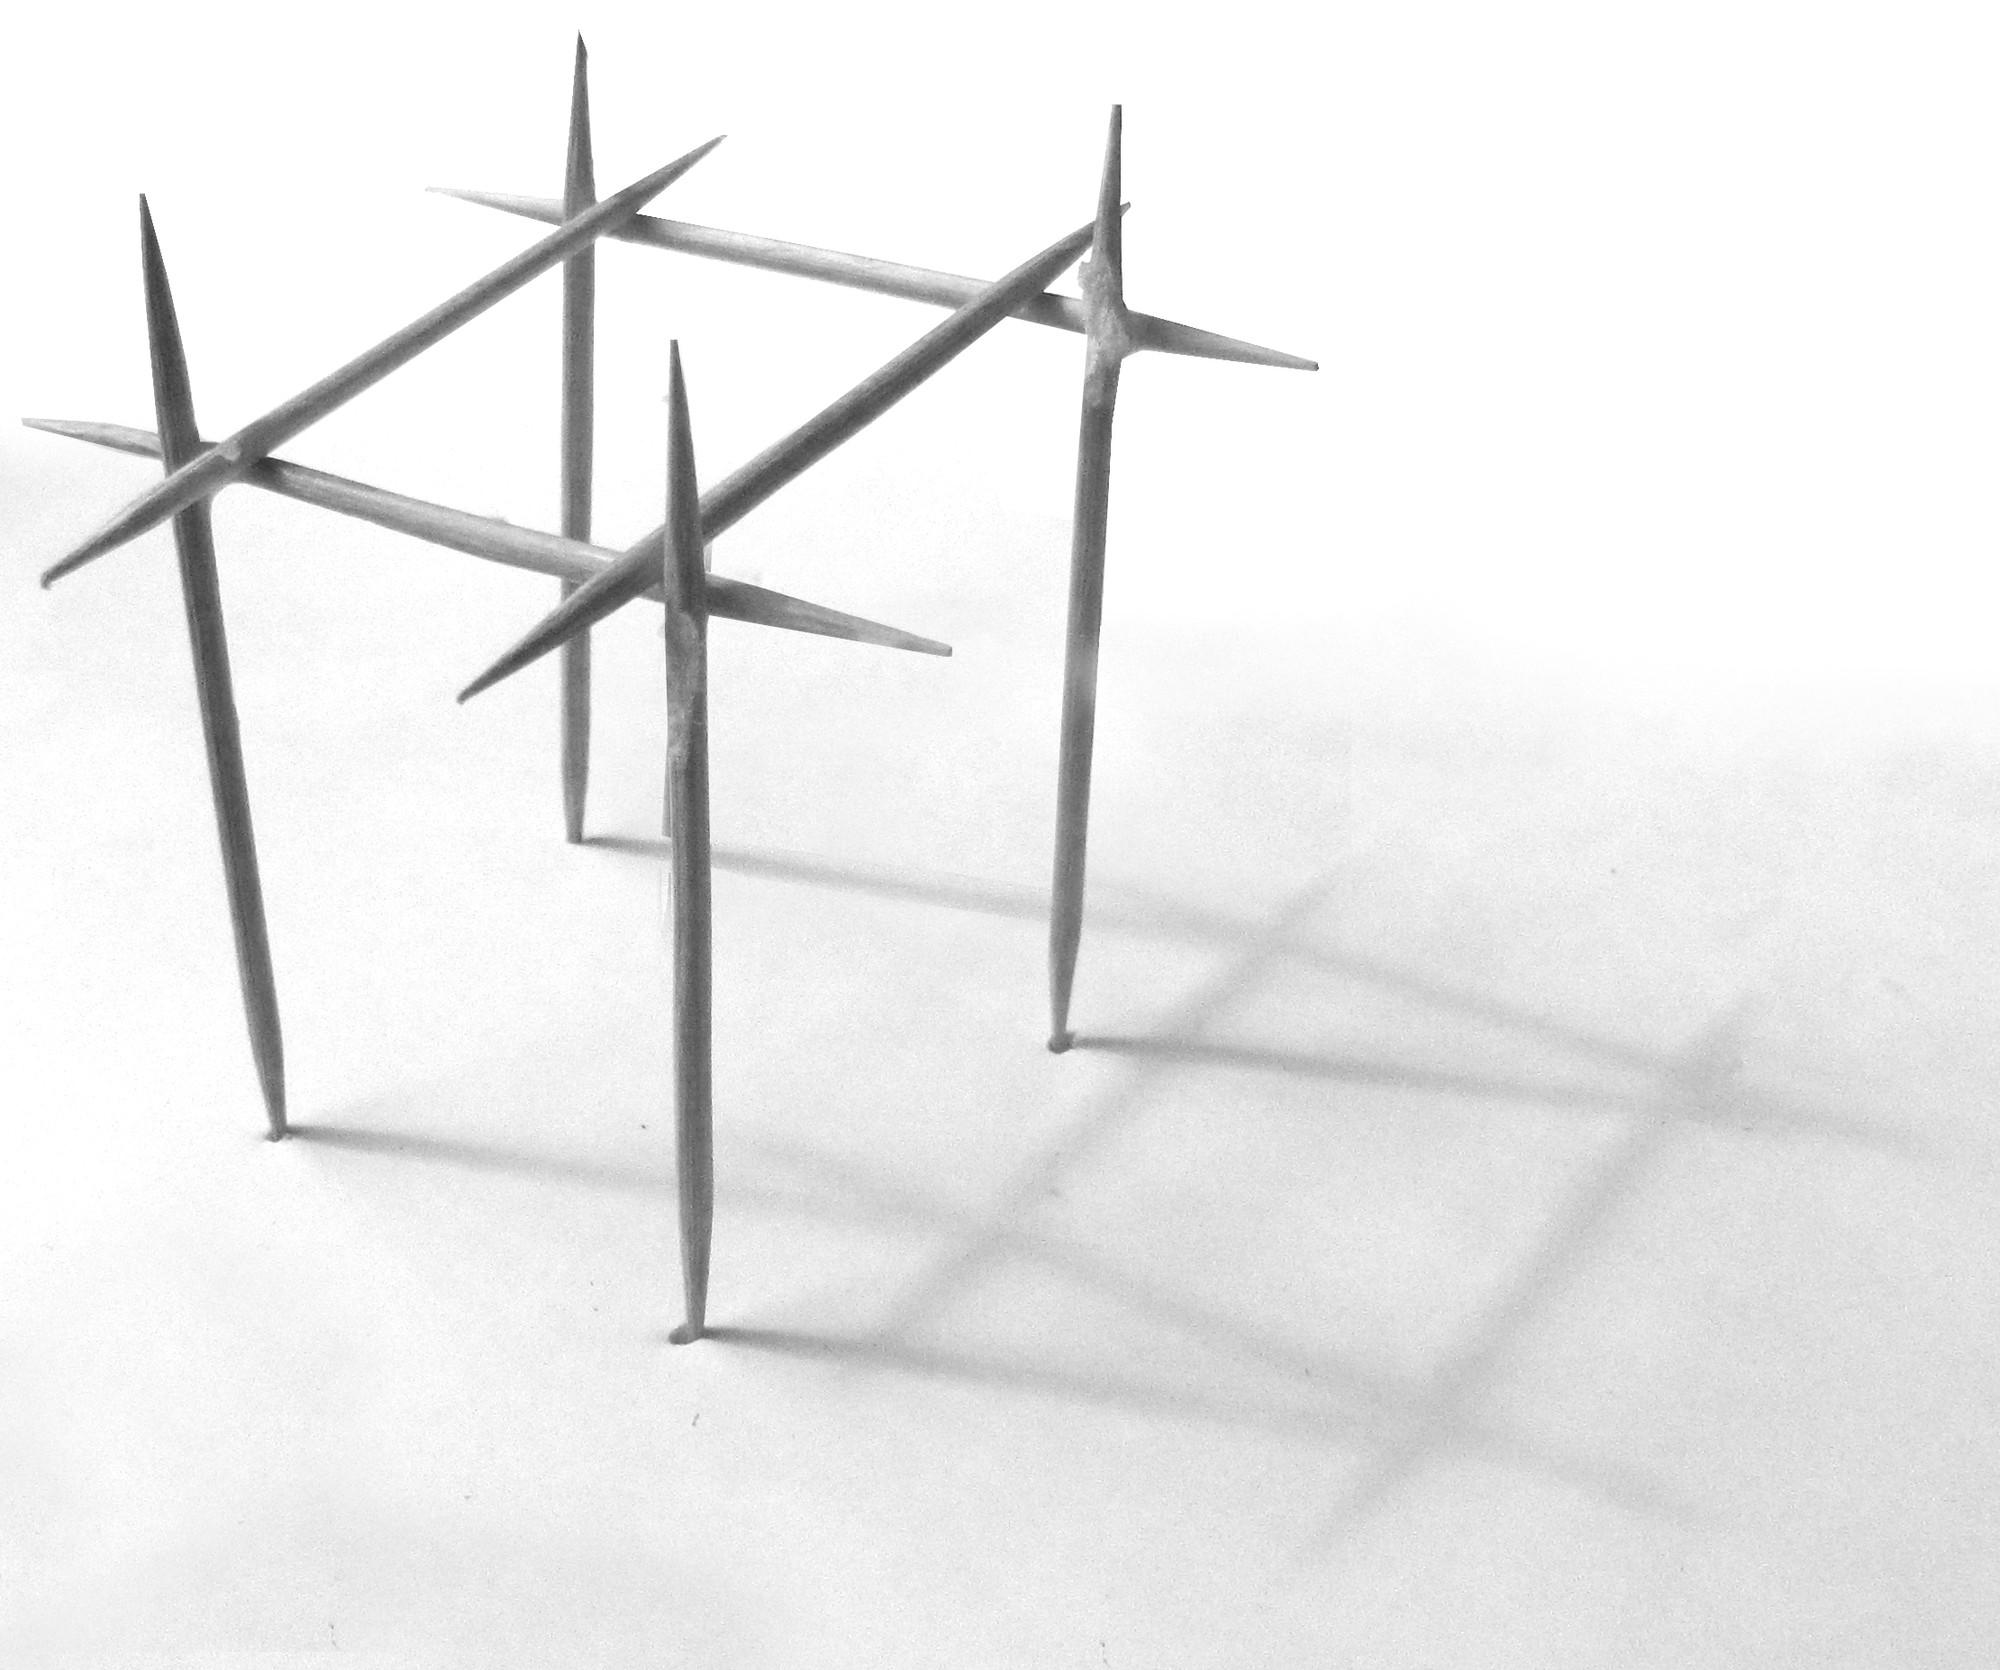 Forma. Image Cortesia de Domingo Arancibia